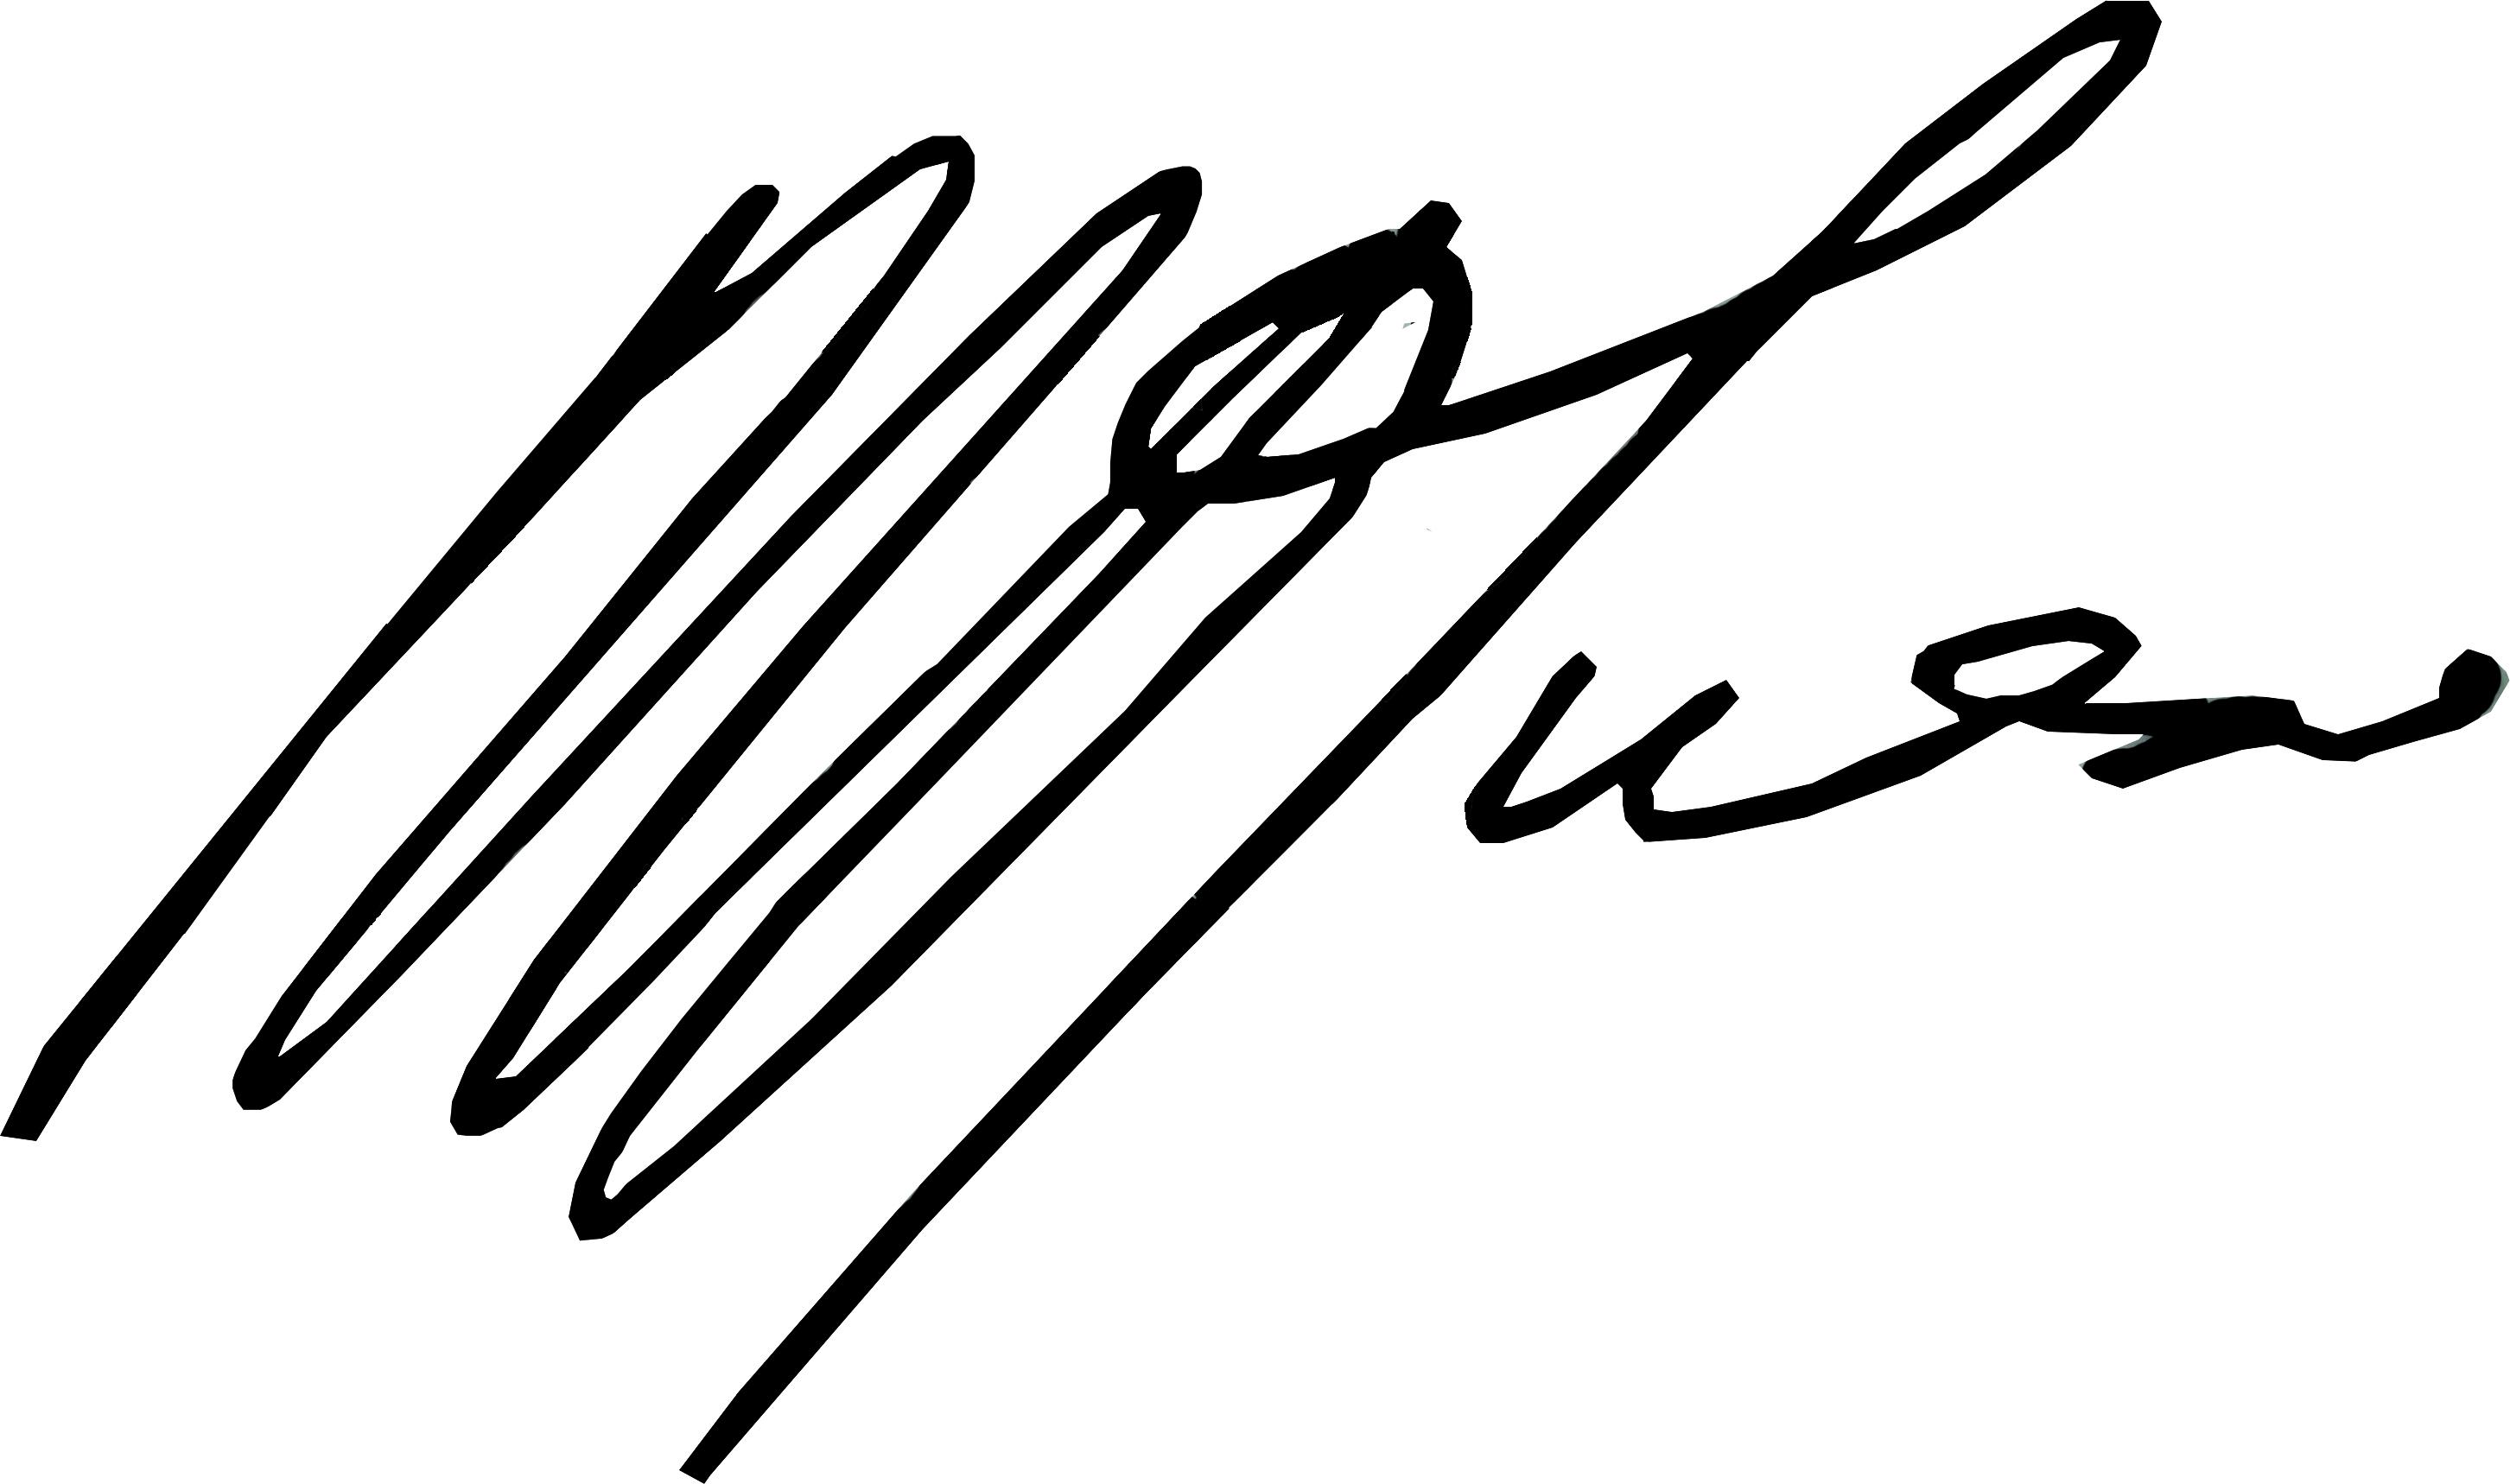 O. Yemi Tubi's Signature